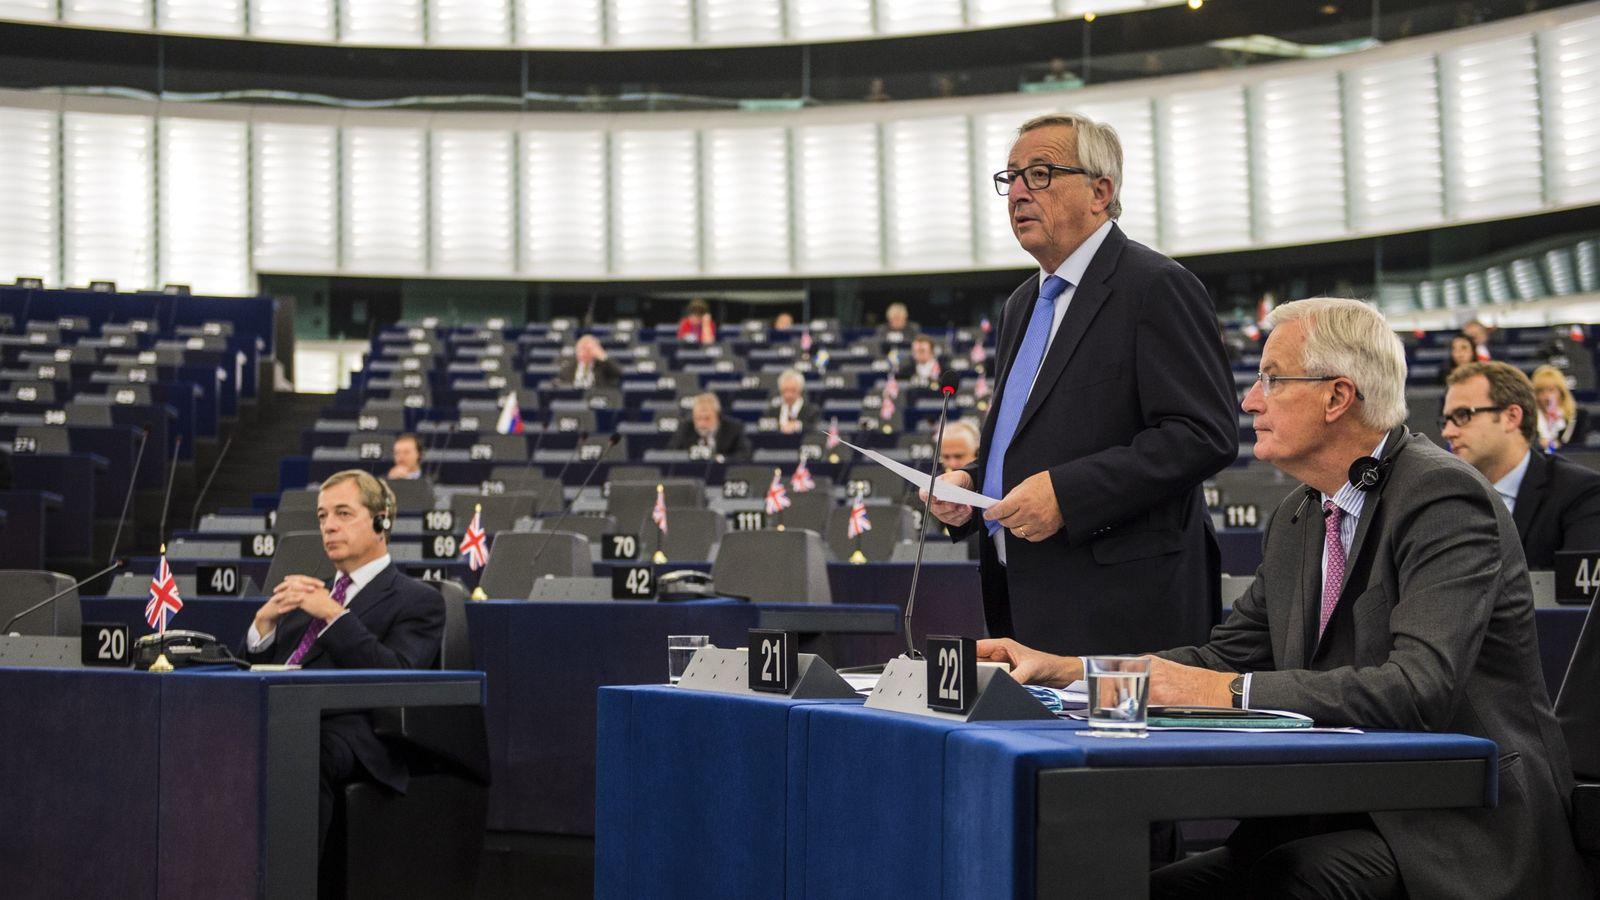 EU Parliament votes for delay in Brexit talks due to lack ...